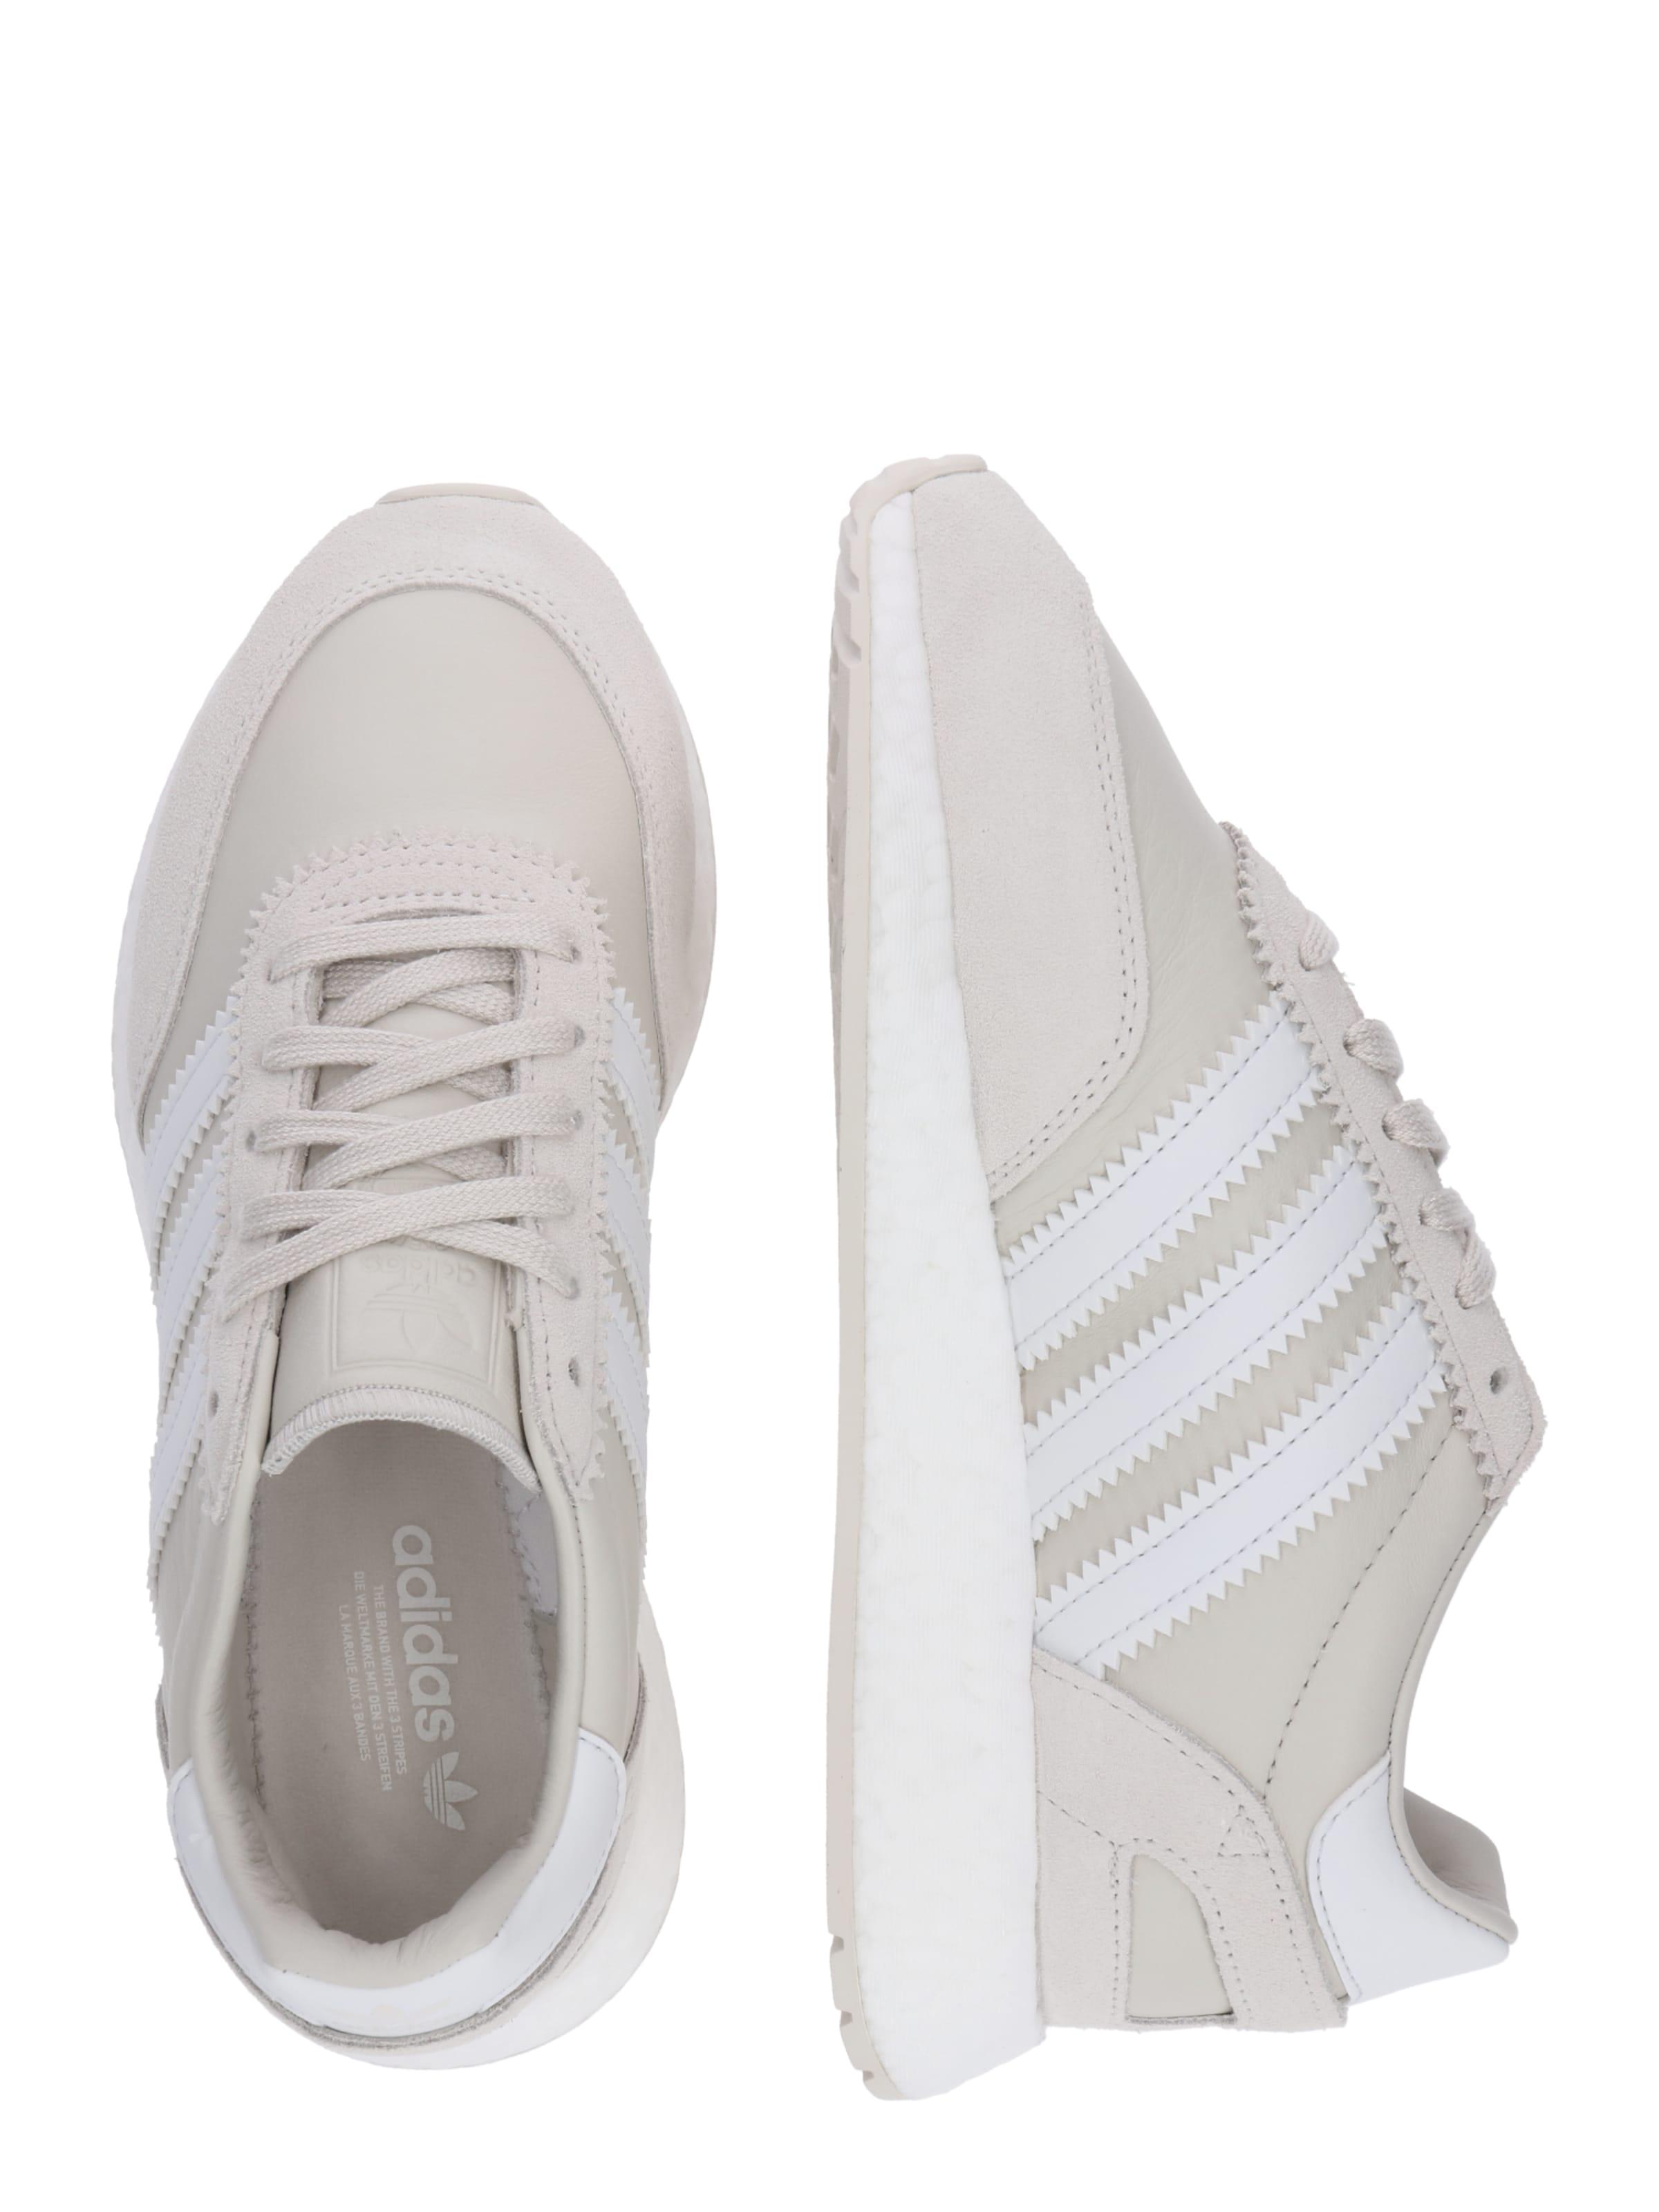 Sneaker 'i Adidas 5923' Originals In HellgrauWeiß shrtQdC